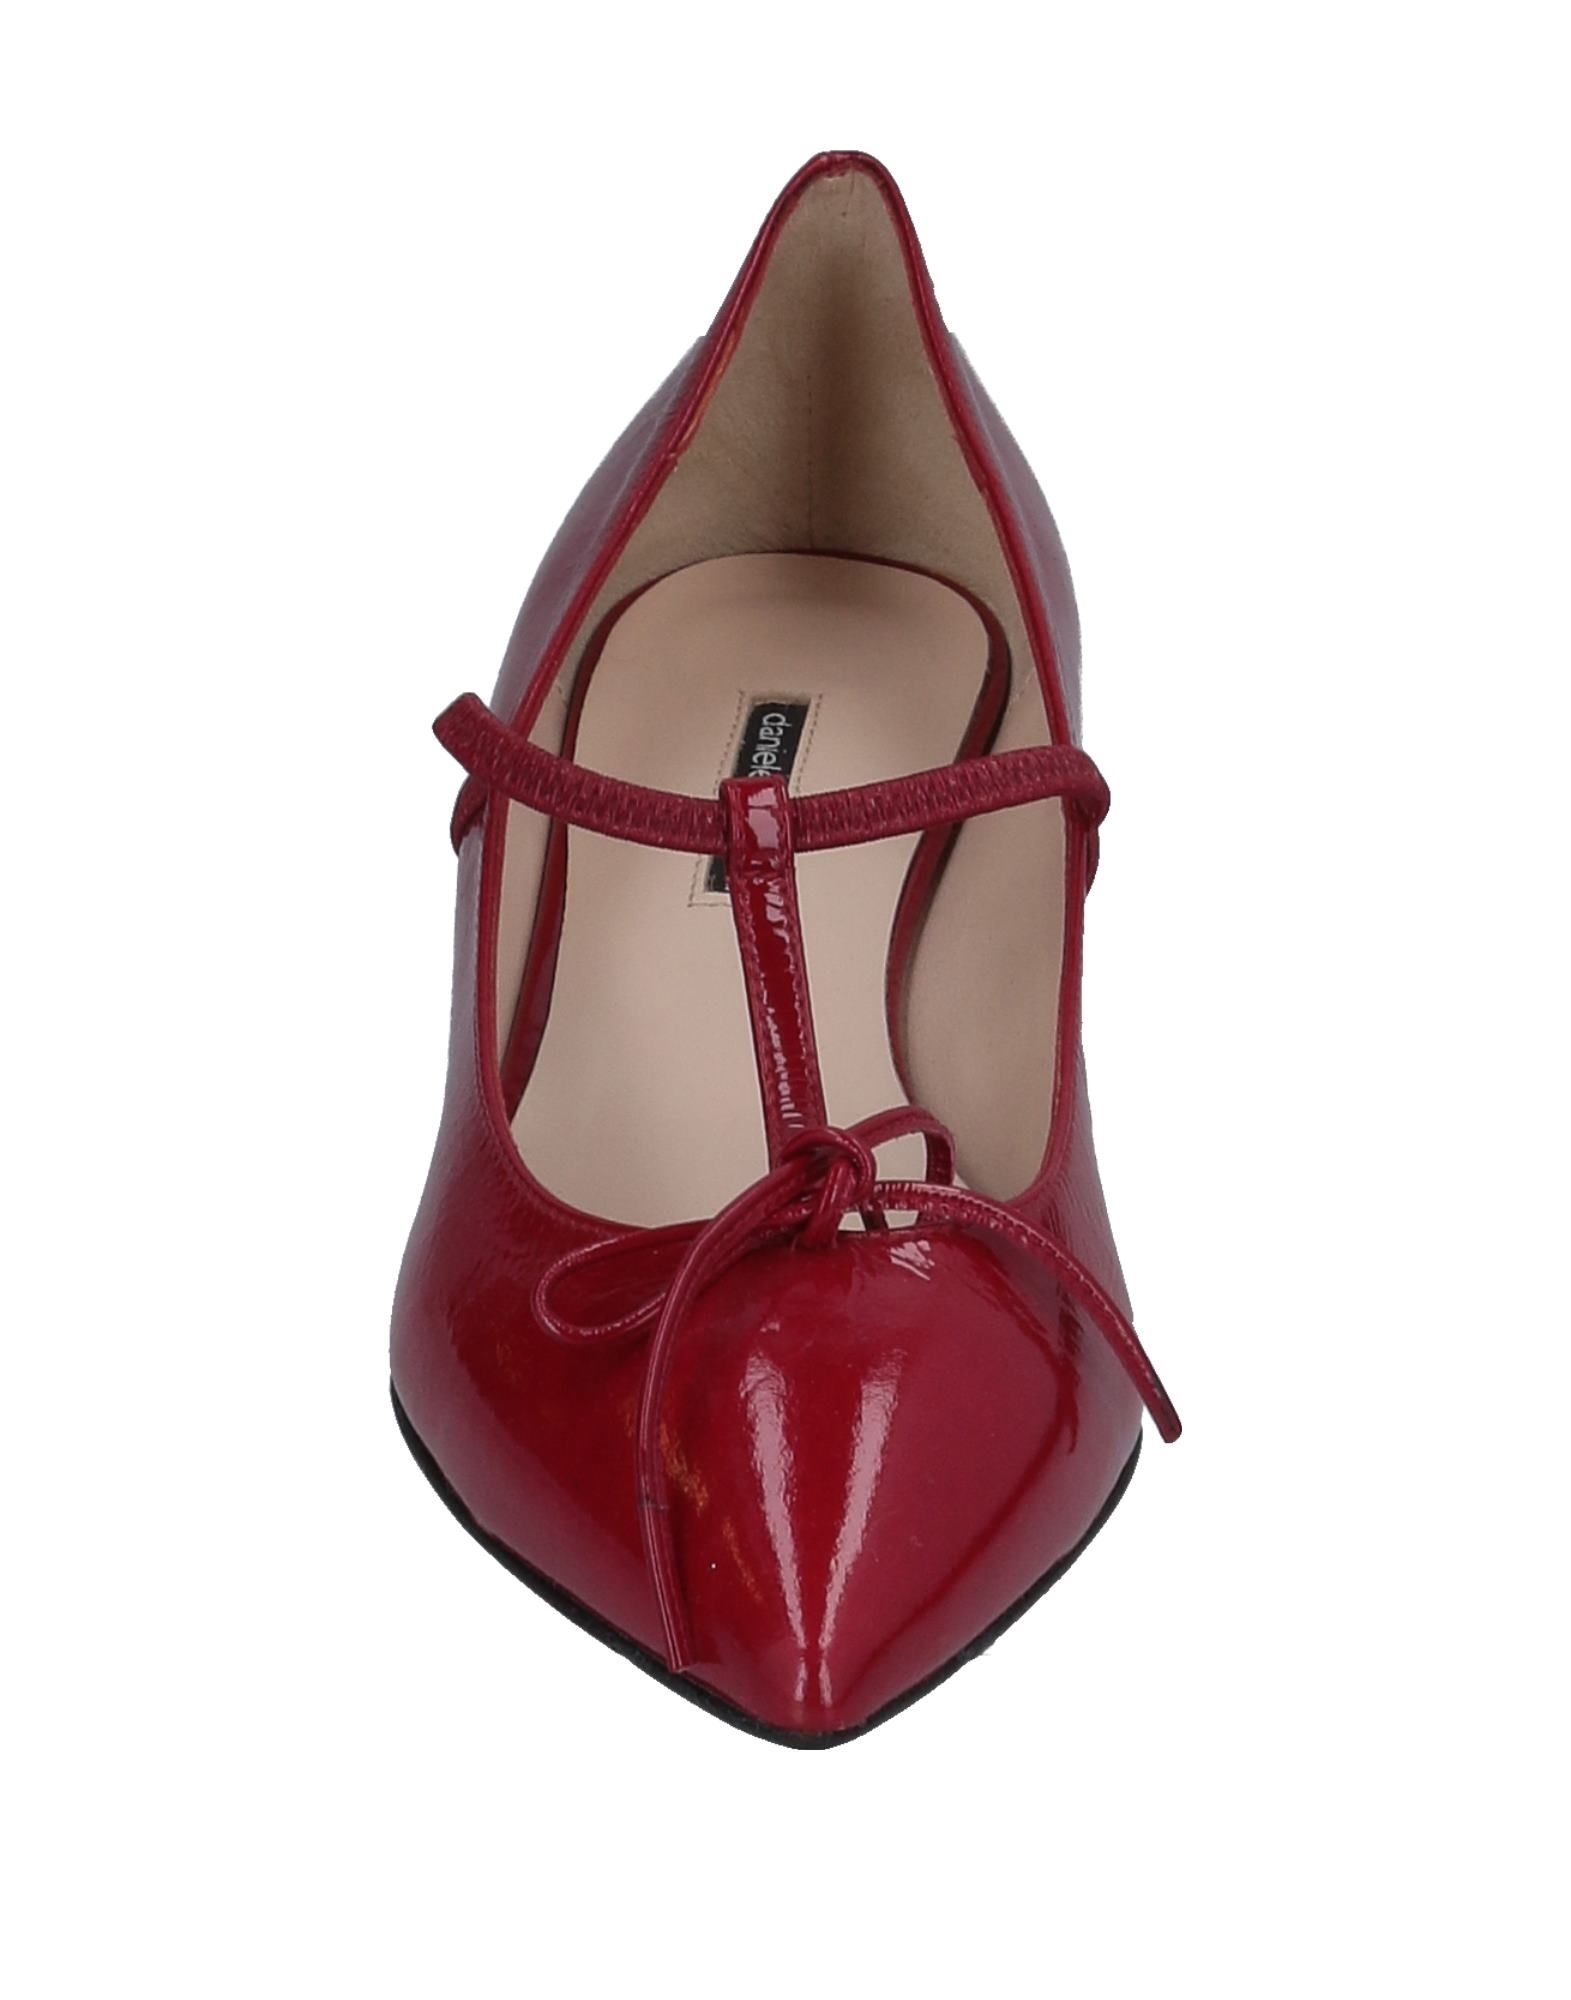 Stilvolle Pumps billige Schuhe Daniele Ancarani Pumps Stilvolle Damen  11518884XB 8ce3e1